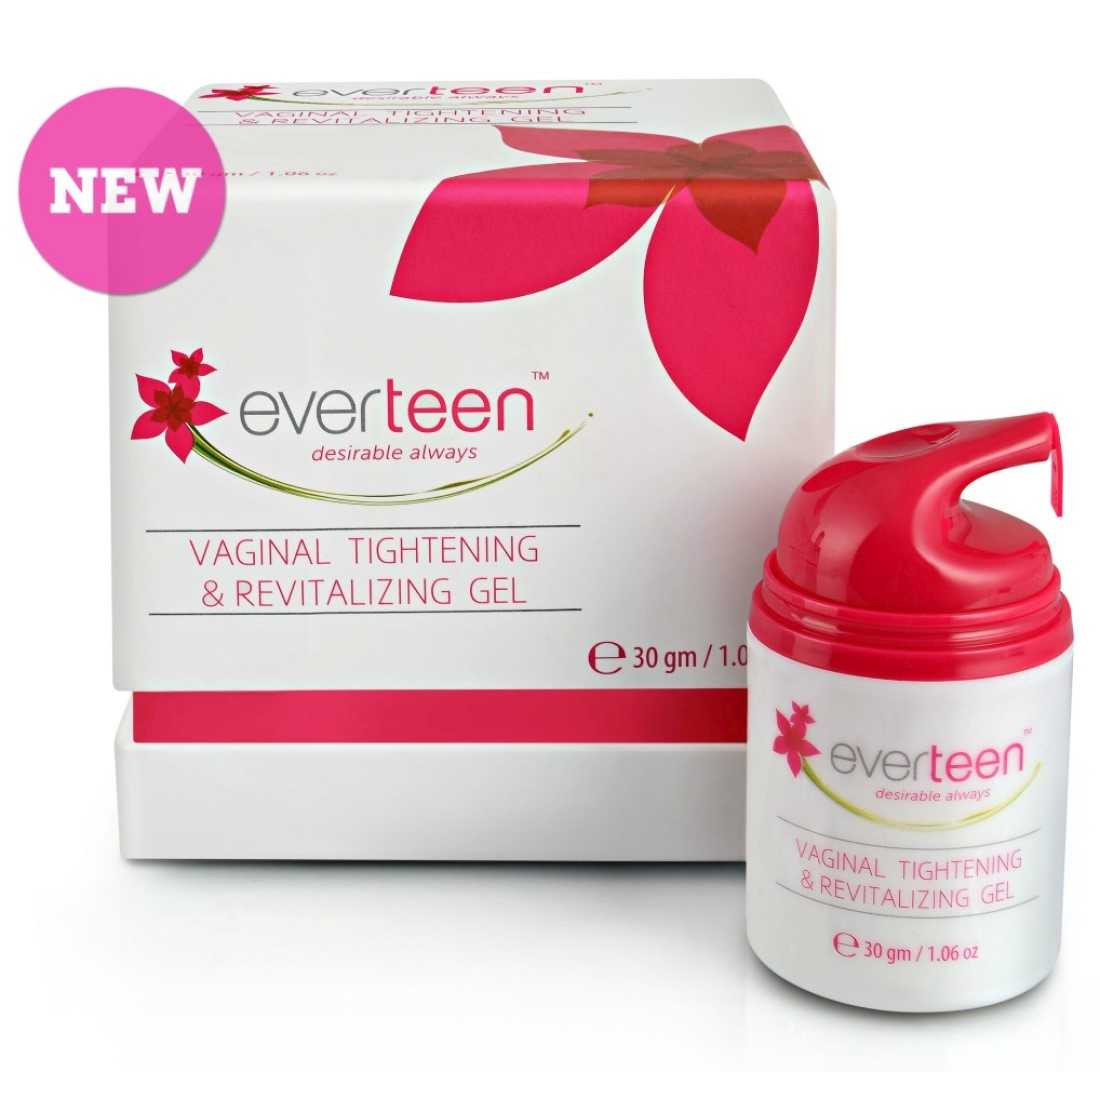 everteen® Vaginal Tightening & Revitalising Gel for Women - 1 Pack (30gm)